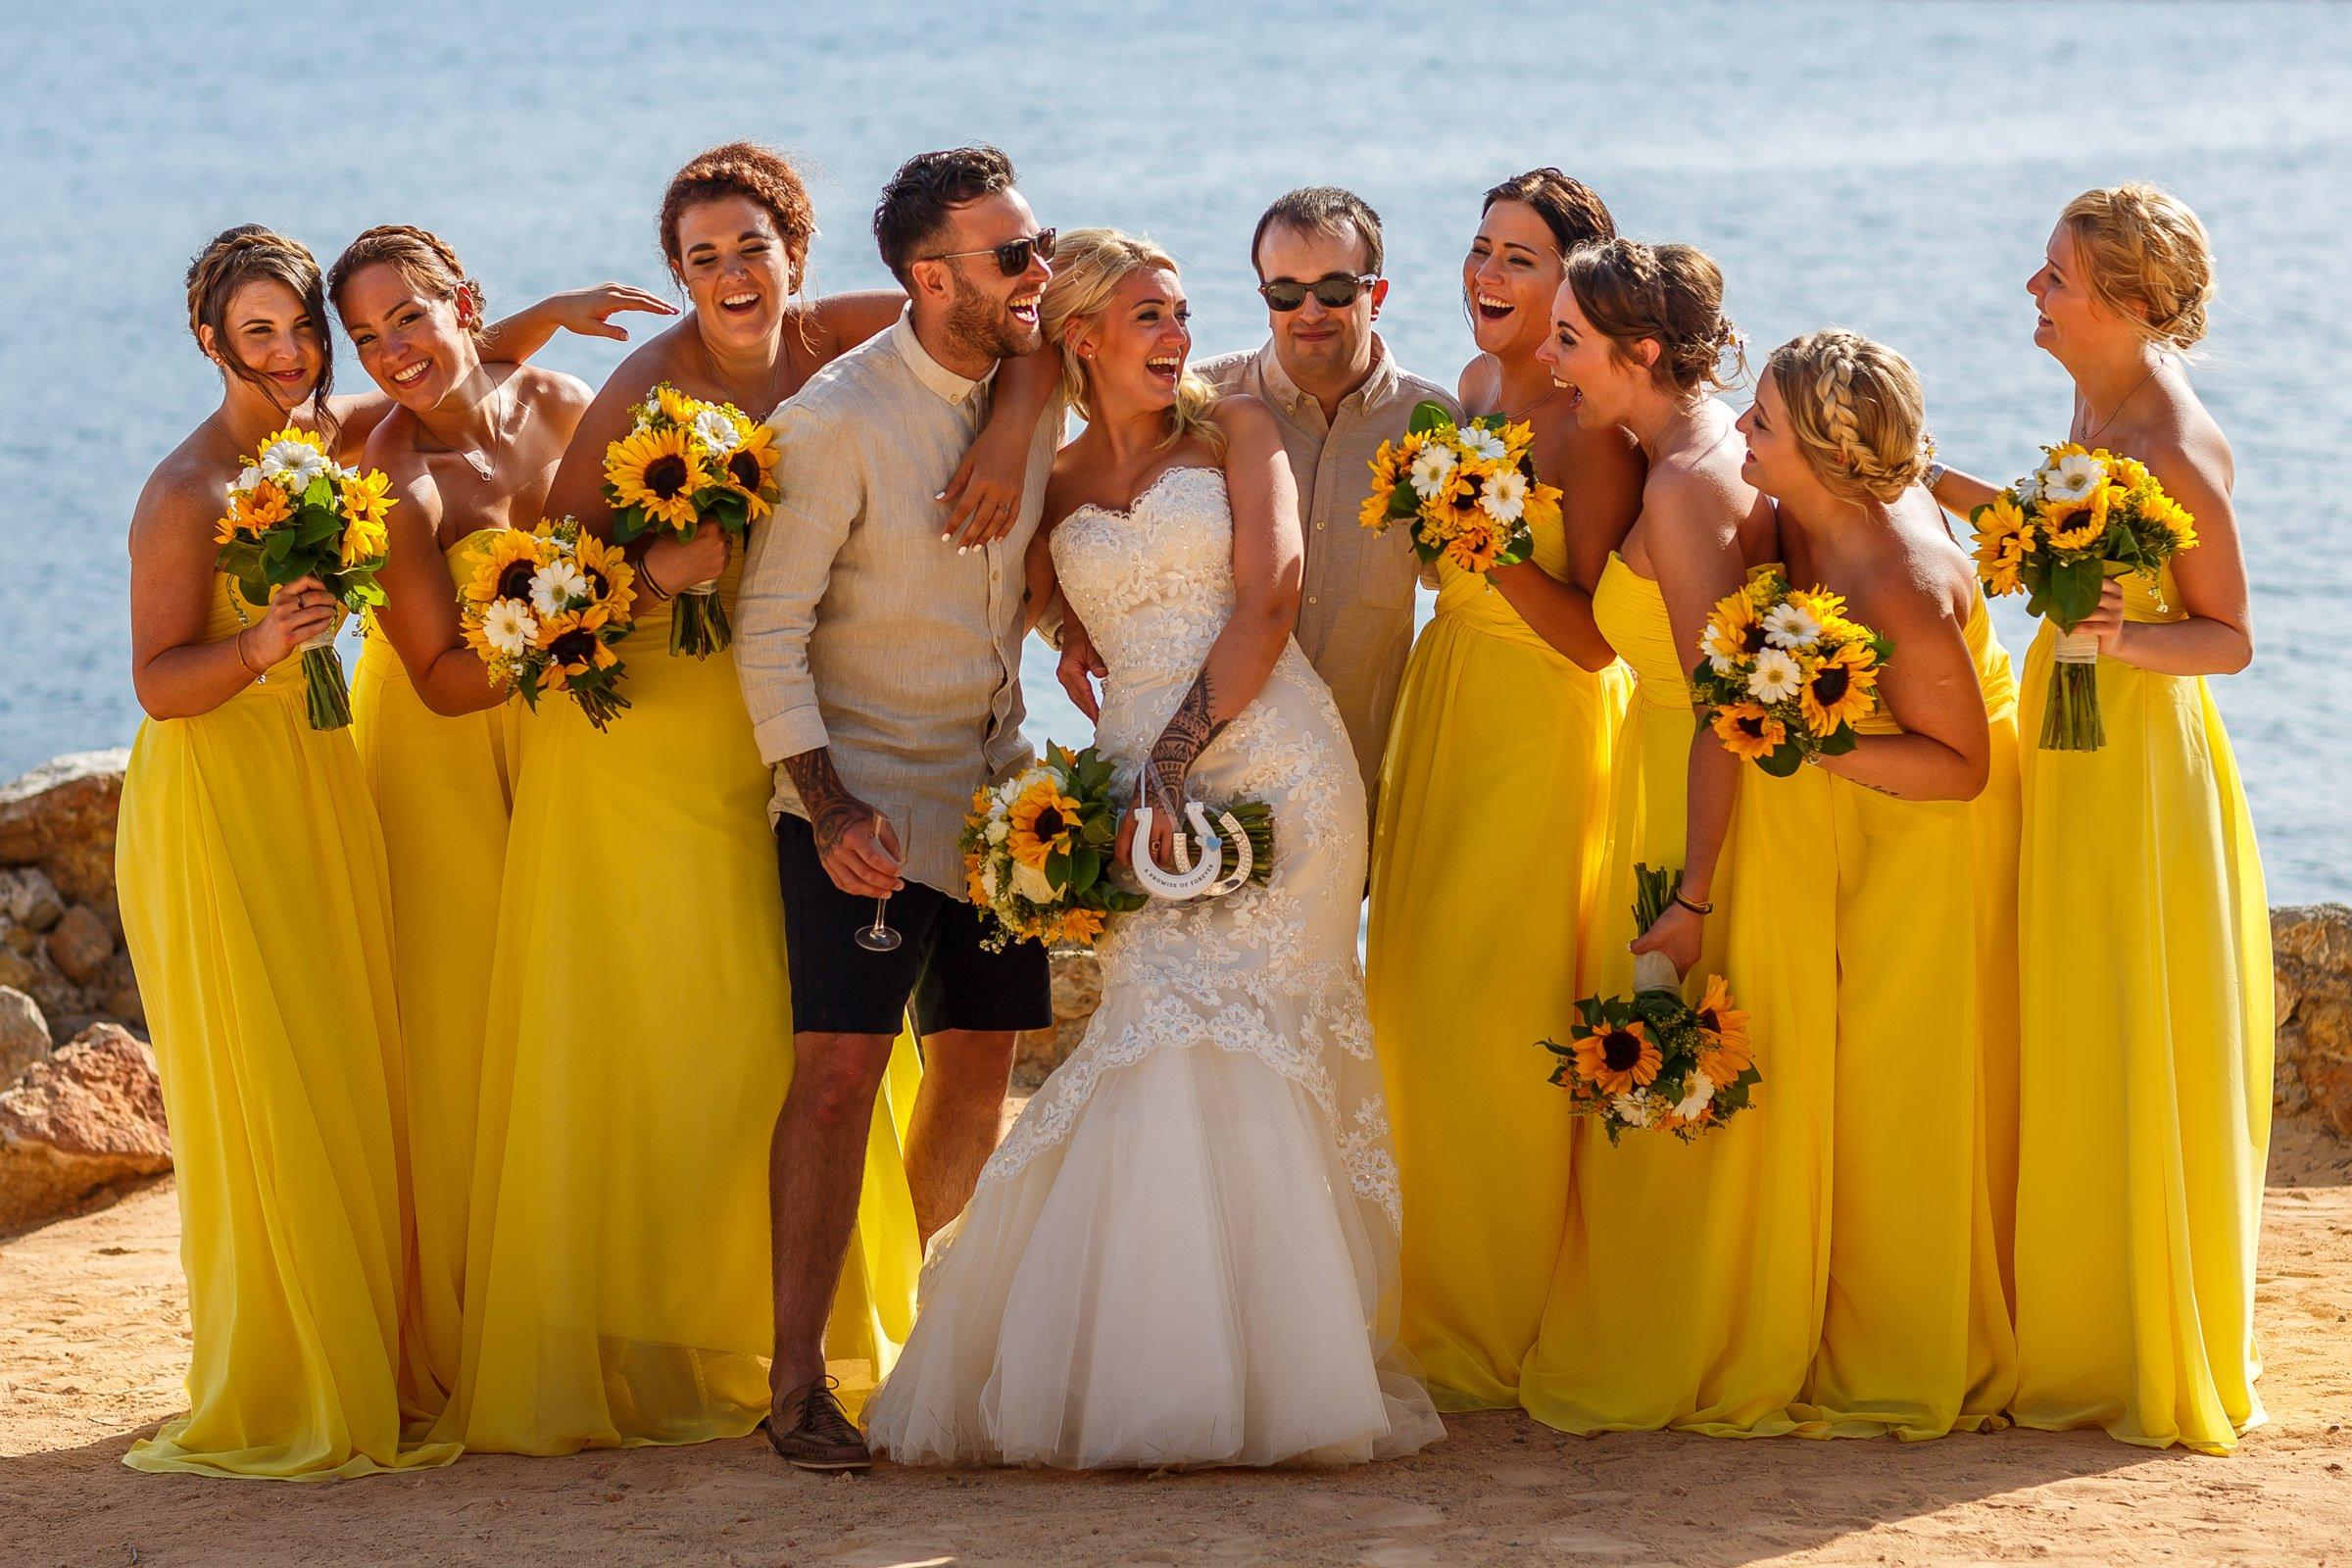 Fun wedding group photo of bridal party